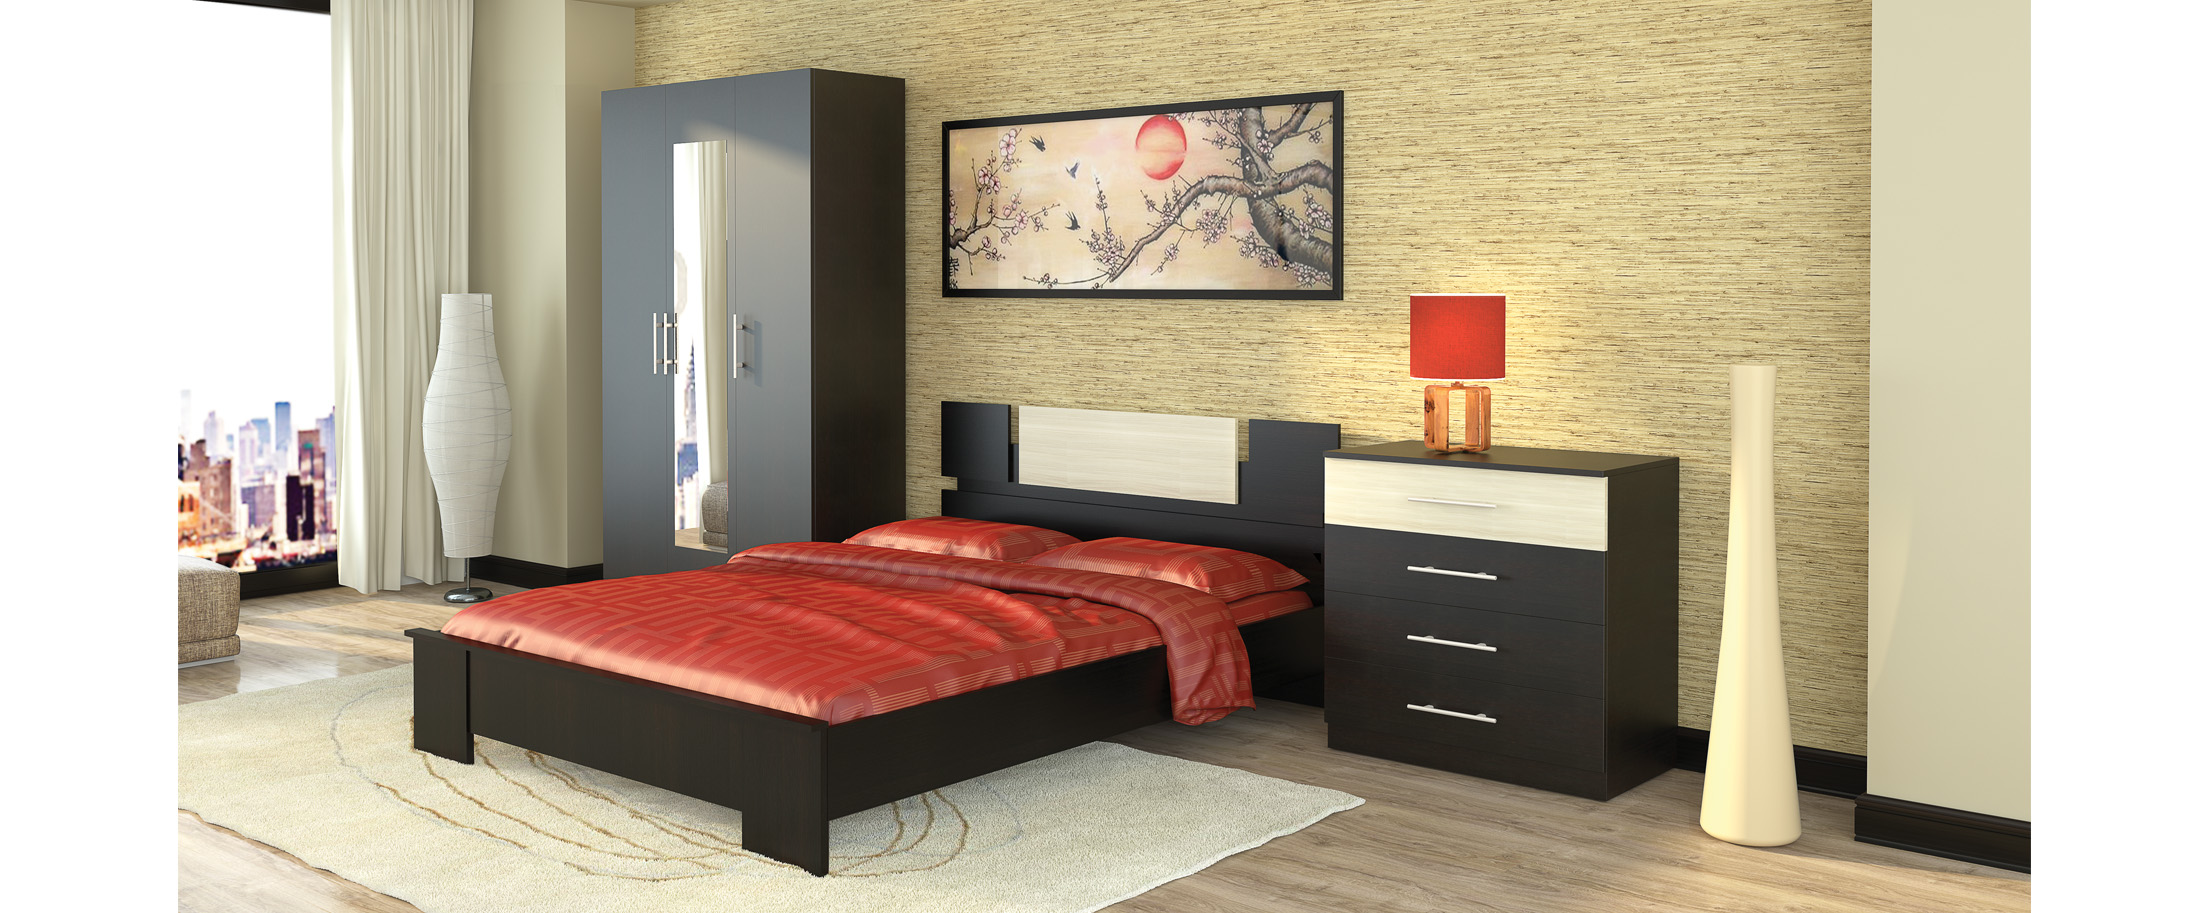 Спальня Оливия 1 Модель 337Кровать 172х205х70, тумба прикроватная 2 шт 40х35х36, шкаф 3-х дверный с зеркалом 120х60х218, комод 80х43х90. Цвет белый дуб. Гарантия 18 месяцев. Доставка от 1 дня.<br>